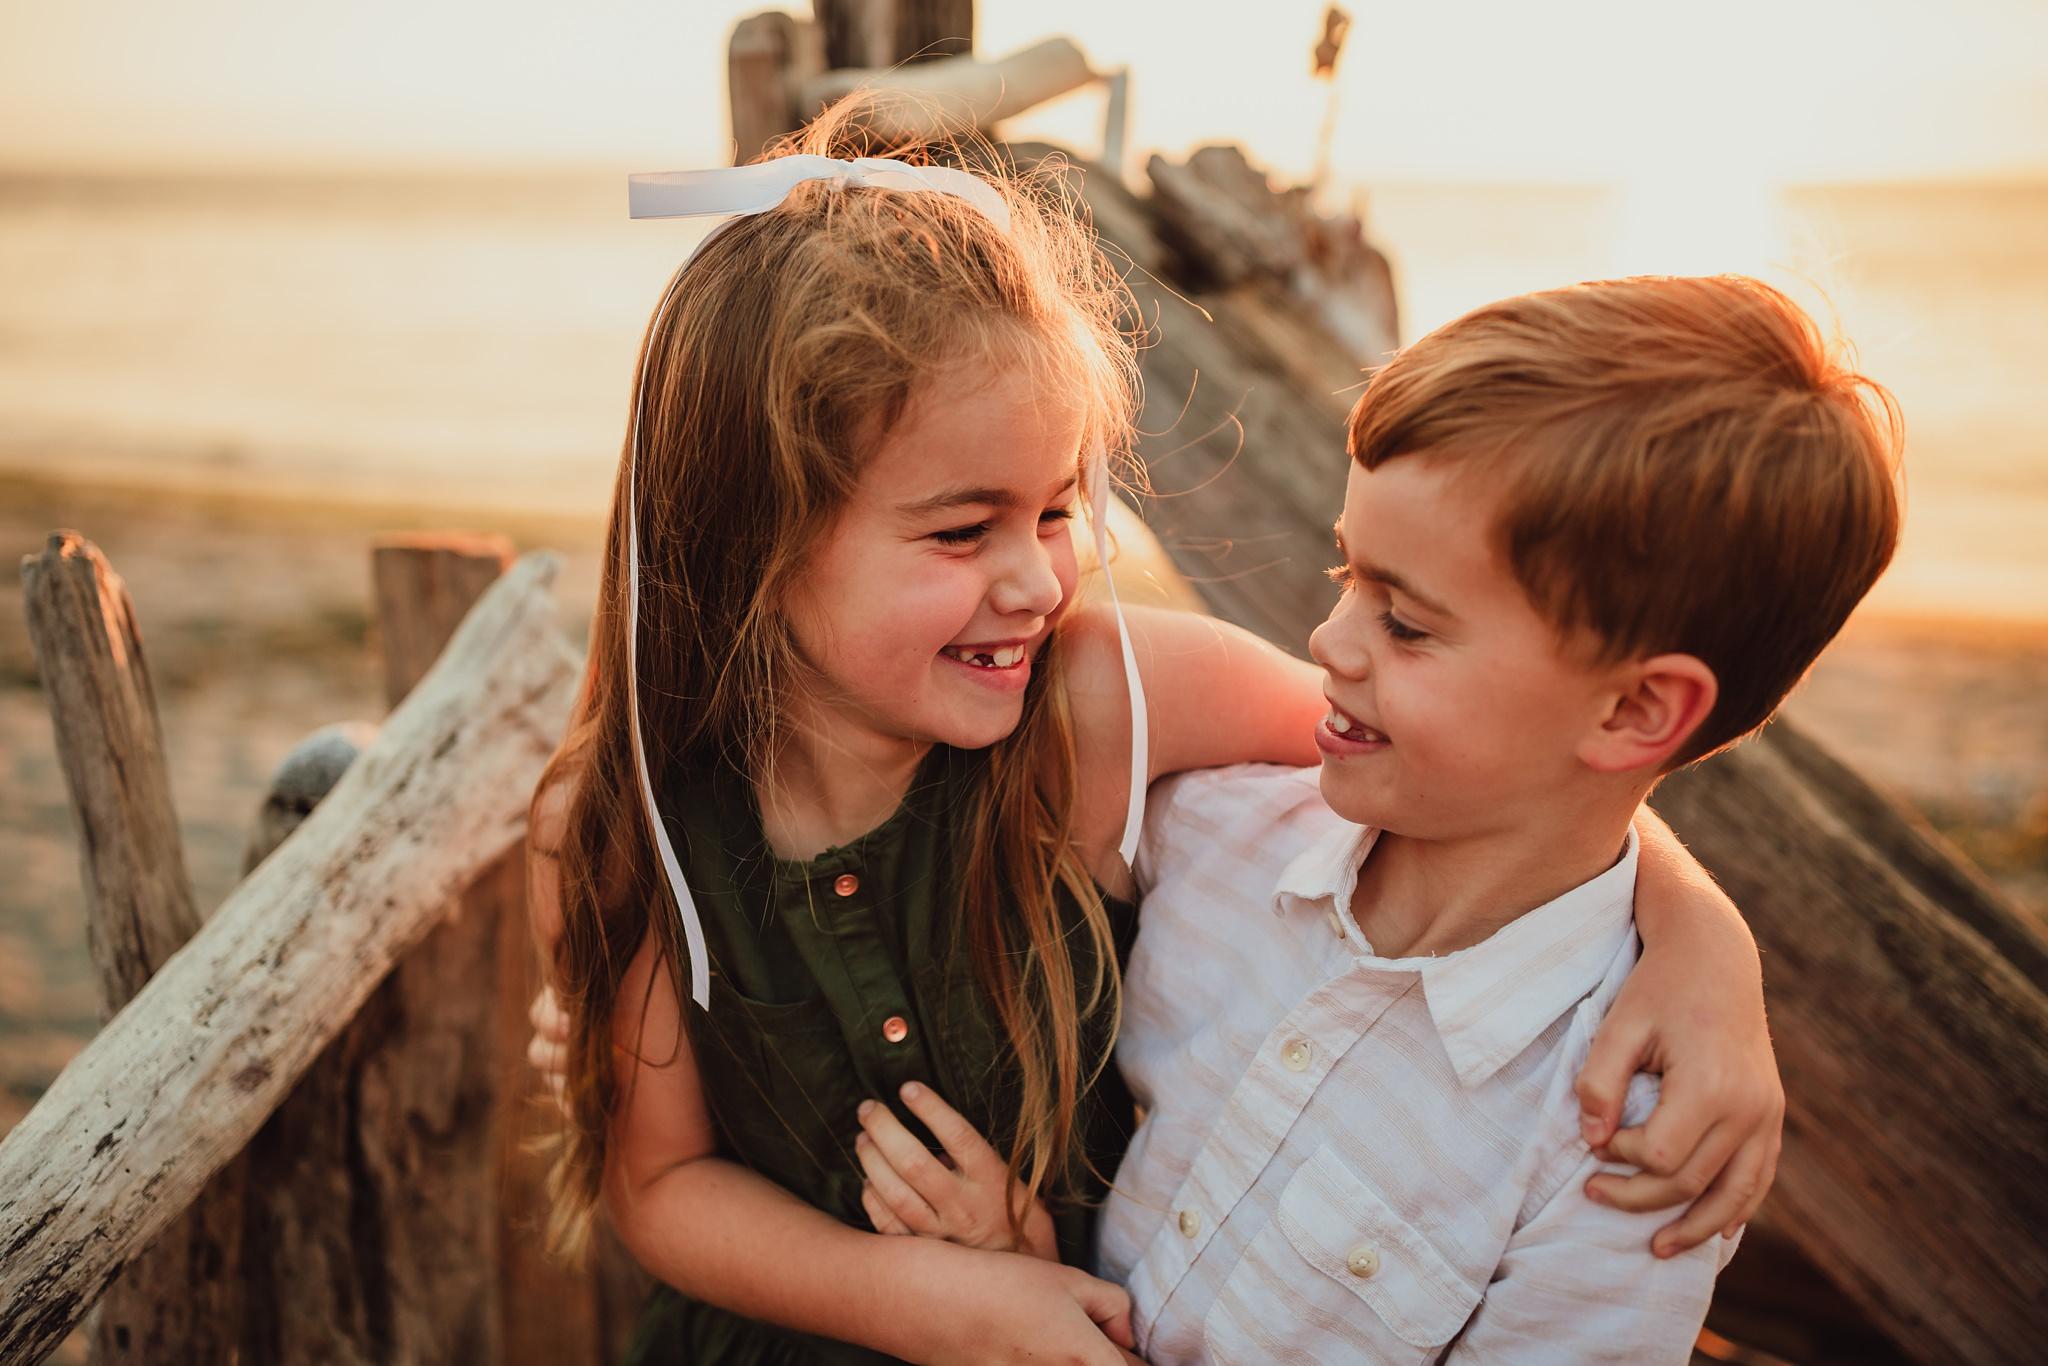 kids hug during family photo session on Washington beach